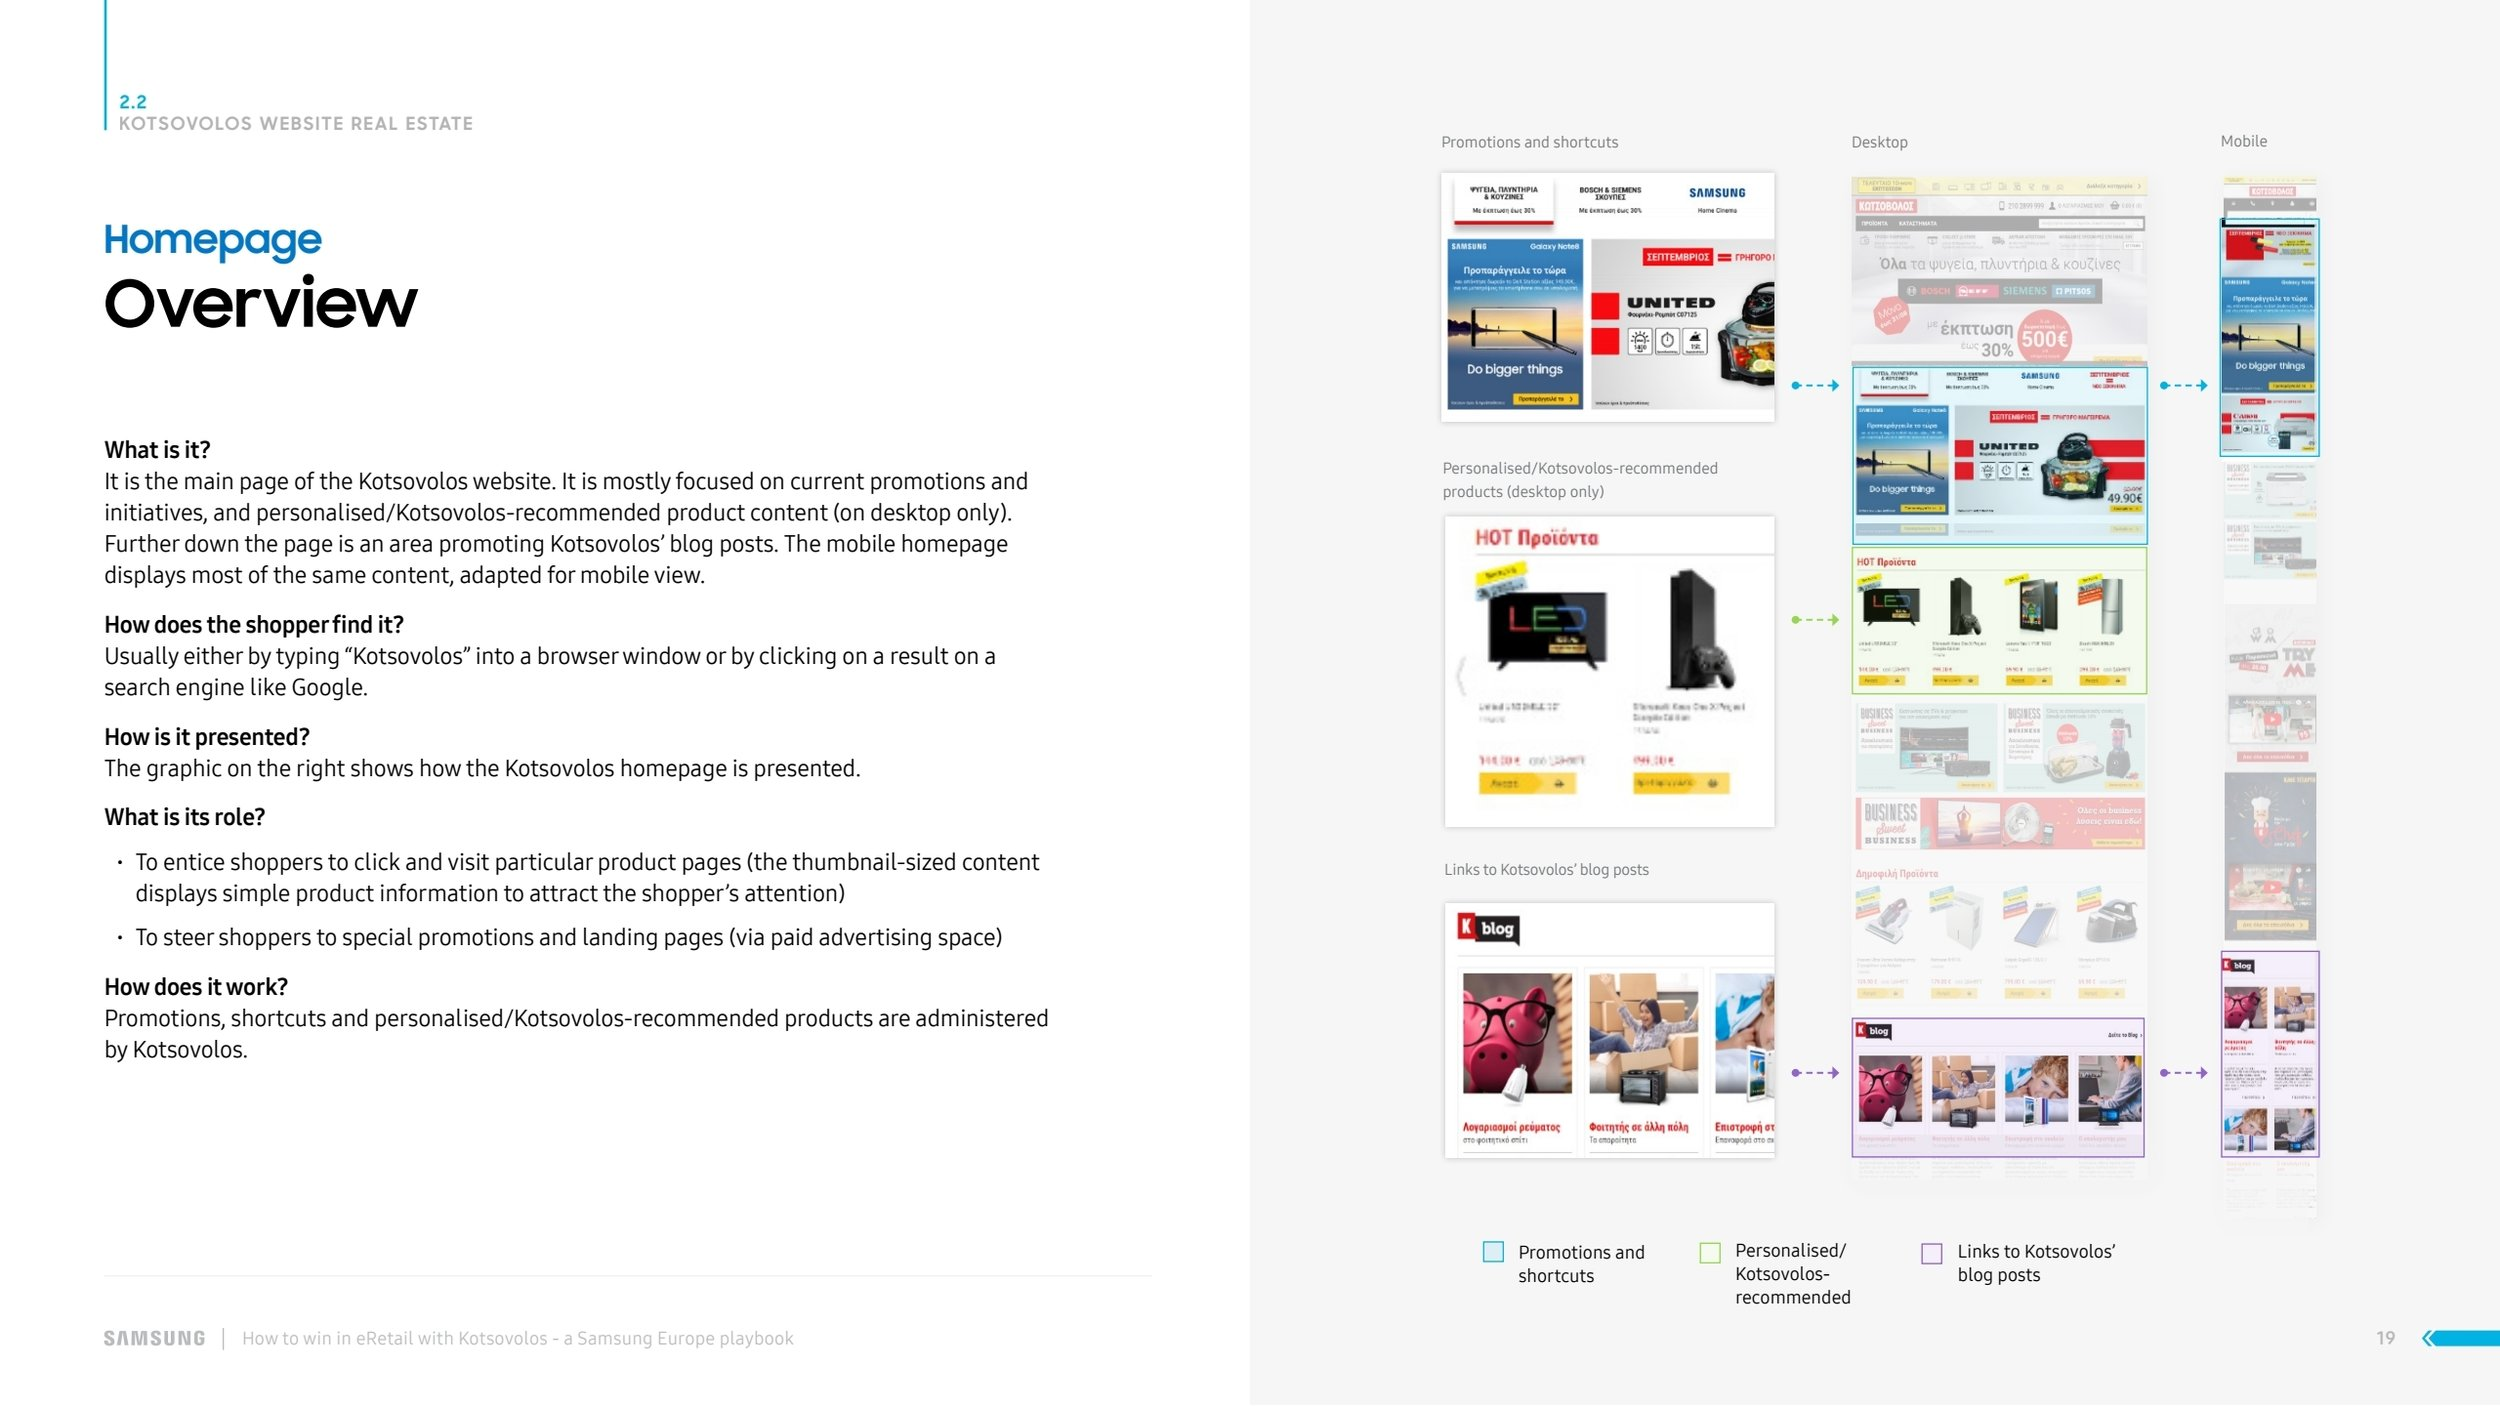 Samsung_Playbook_Kotsovolos_009-AG-PORTFOLIO_page_12.jpg